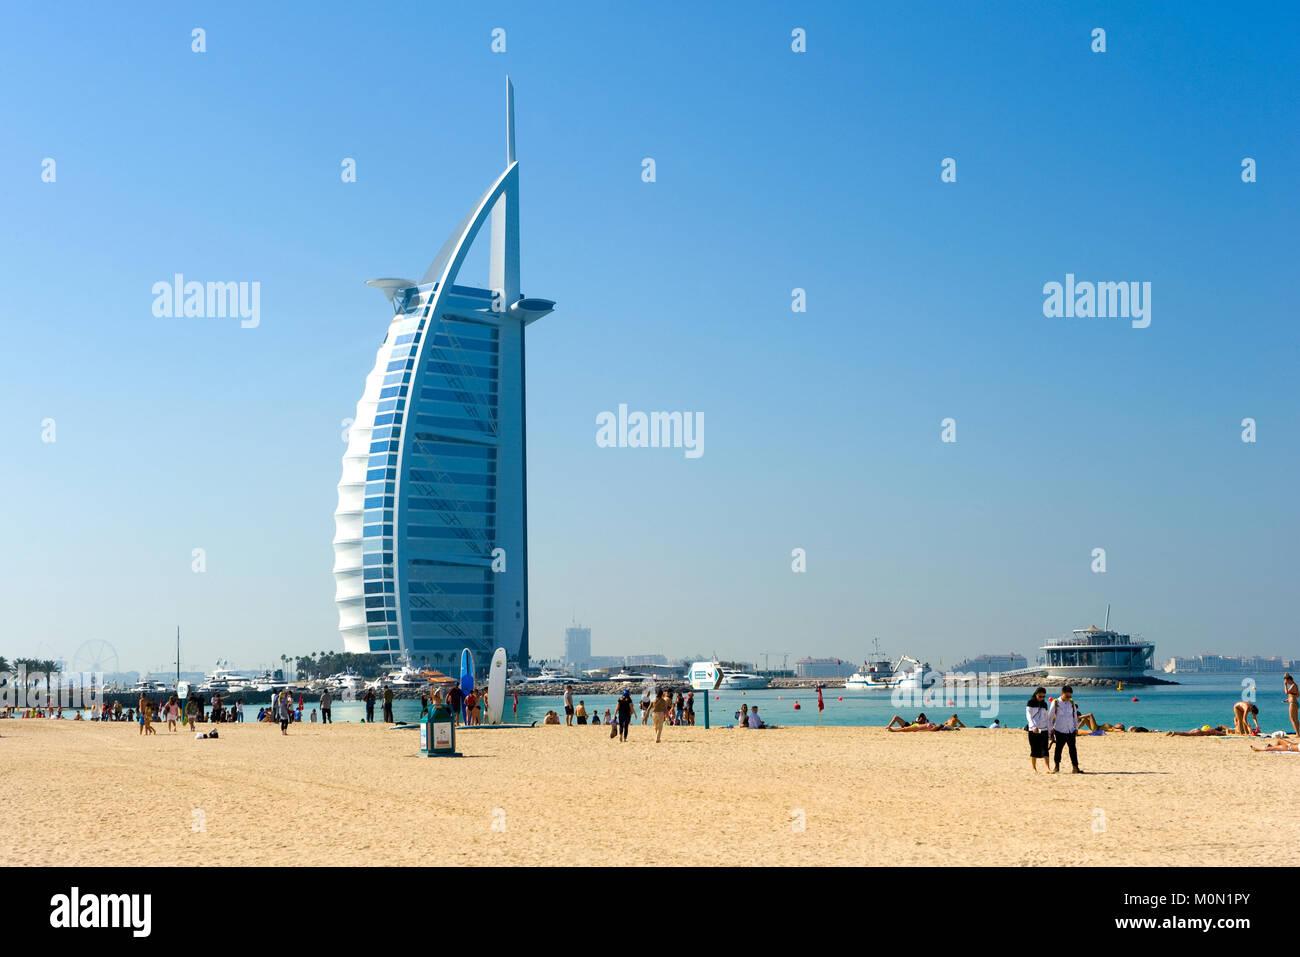 DUBAI, UNITED ARAB EMIRATES - JAN 02, 2018: Public beach of Dubai near the Burj Al Arab hotel. - Stock Image